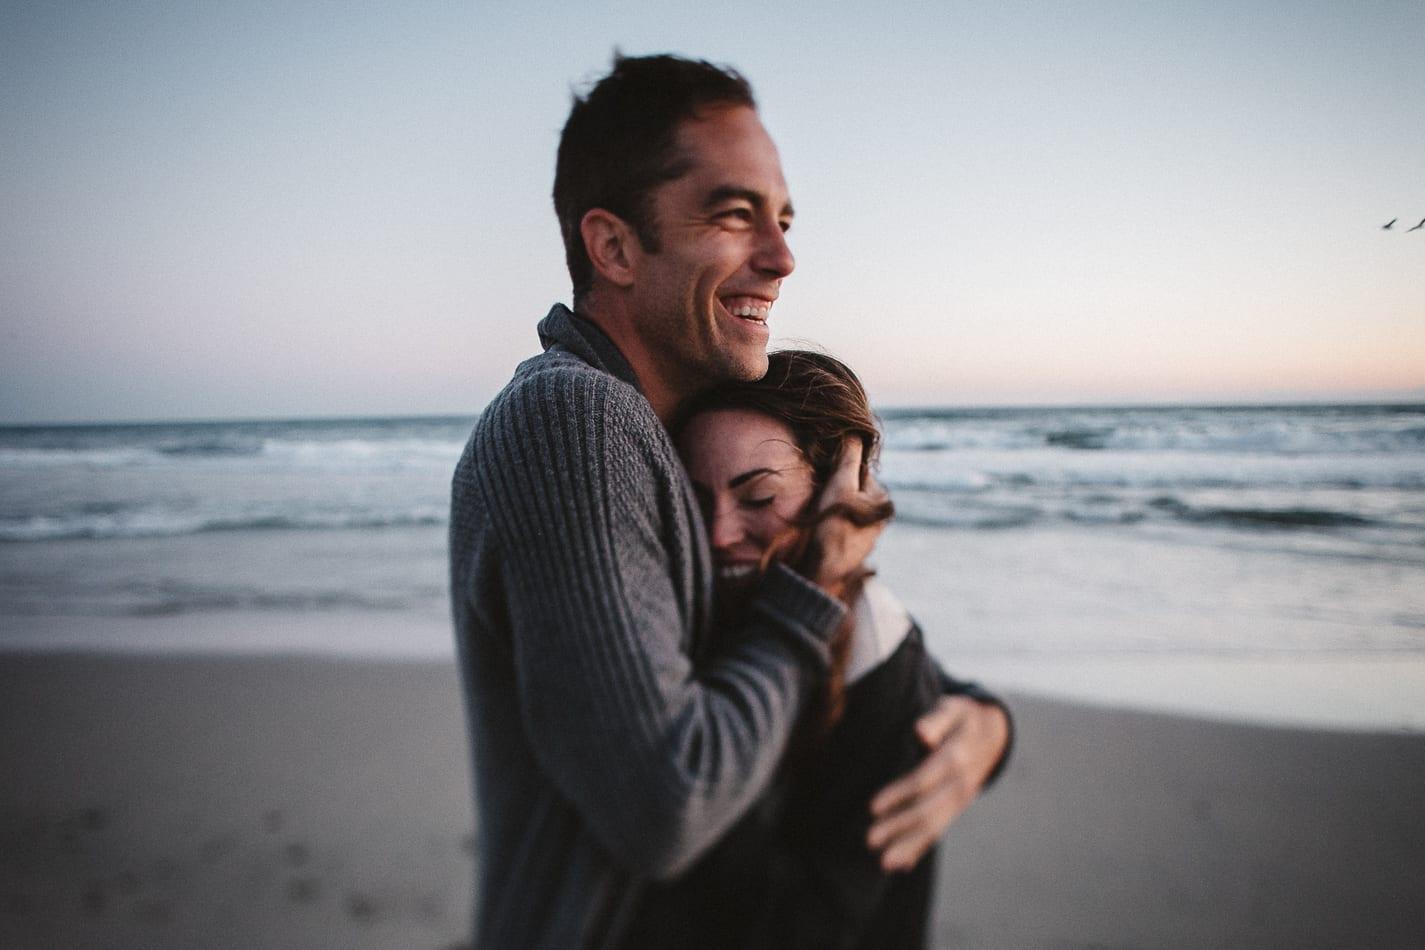 jason-alyssa-huntington-beach-california-engagement-photographer-43